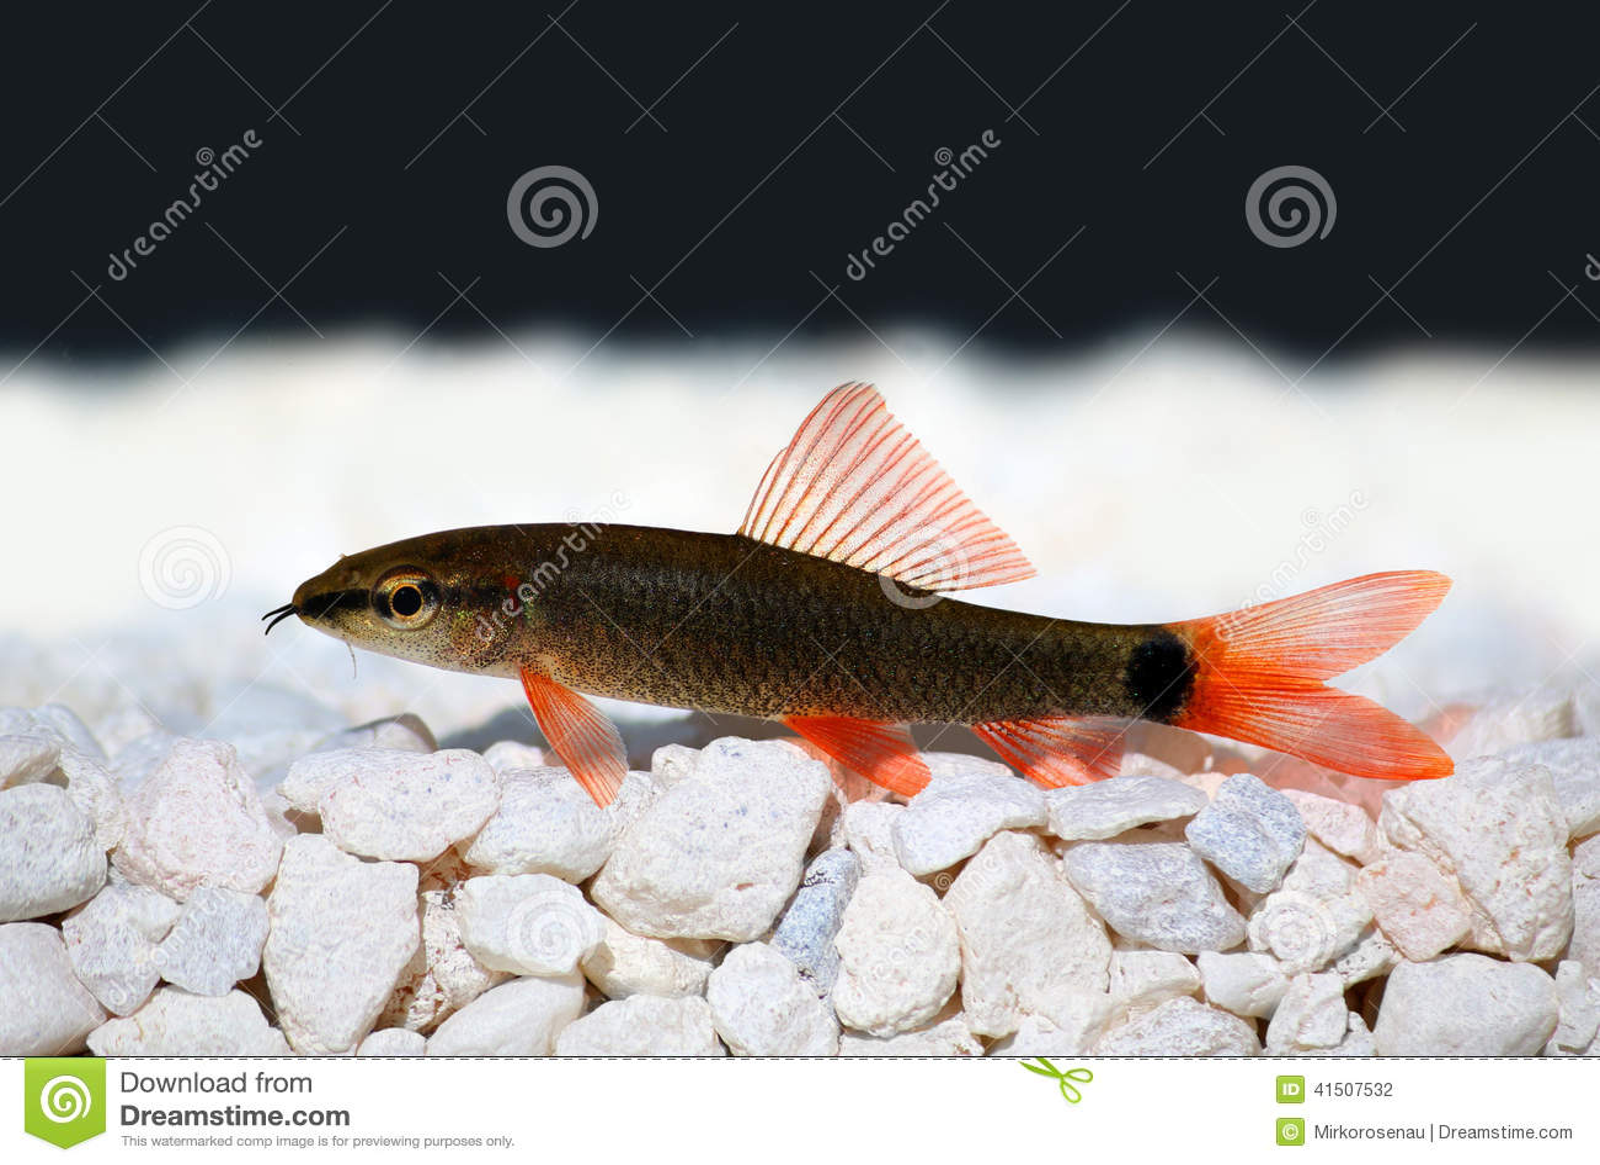 Freshwater aquarium fish rainbow shark - Rainbow Shark Catfish Epalzeorhynchos Frenatum Stock Photography